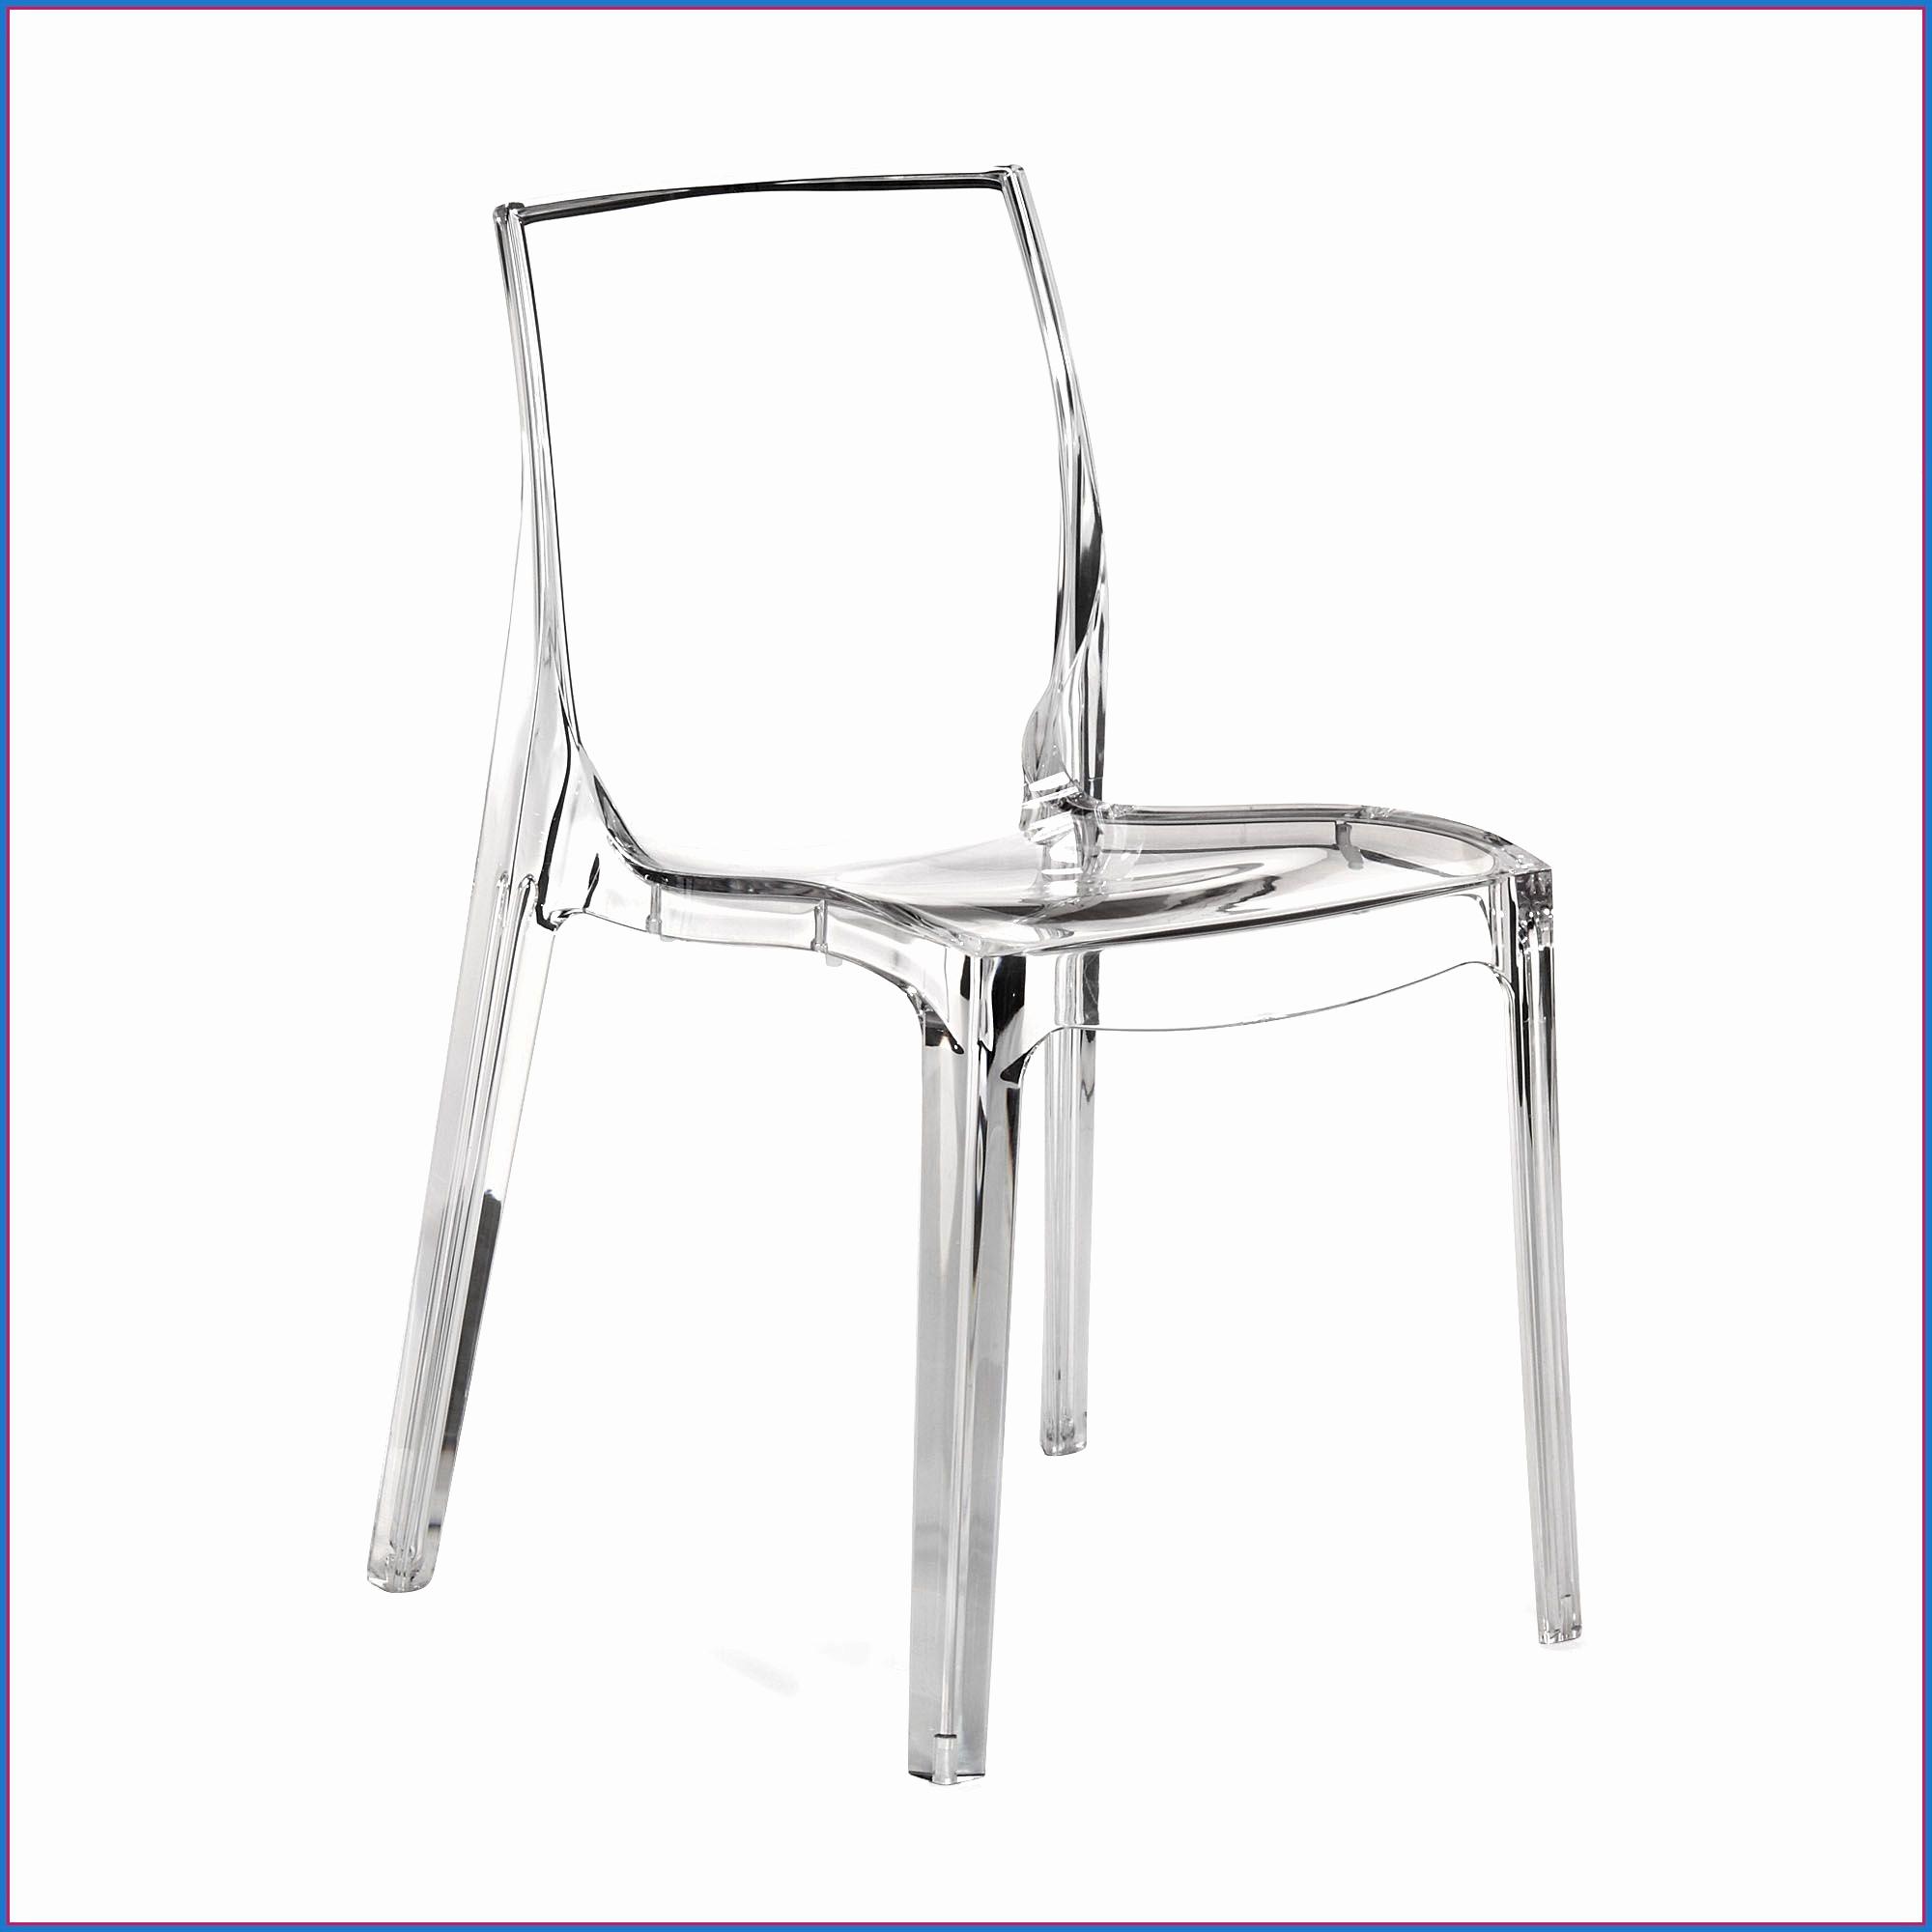 Table Cuisine Conforama Impressionnant Stock Chaise Pour Salon Luxe Chaise A Conforama Luxe Chaises Conforama